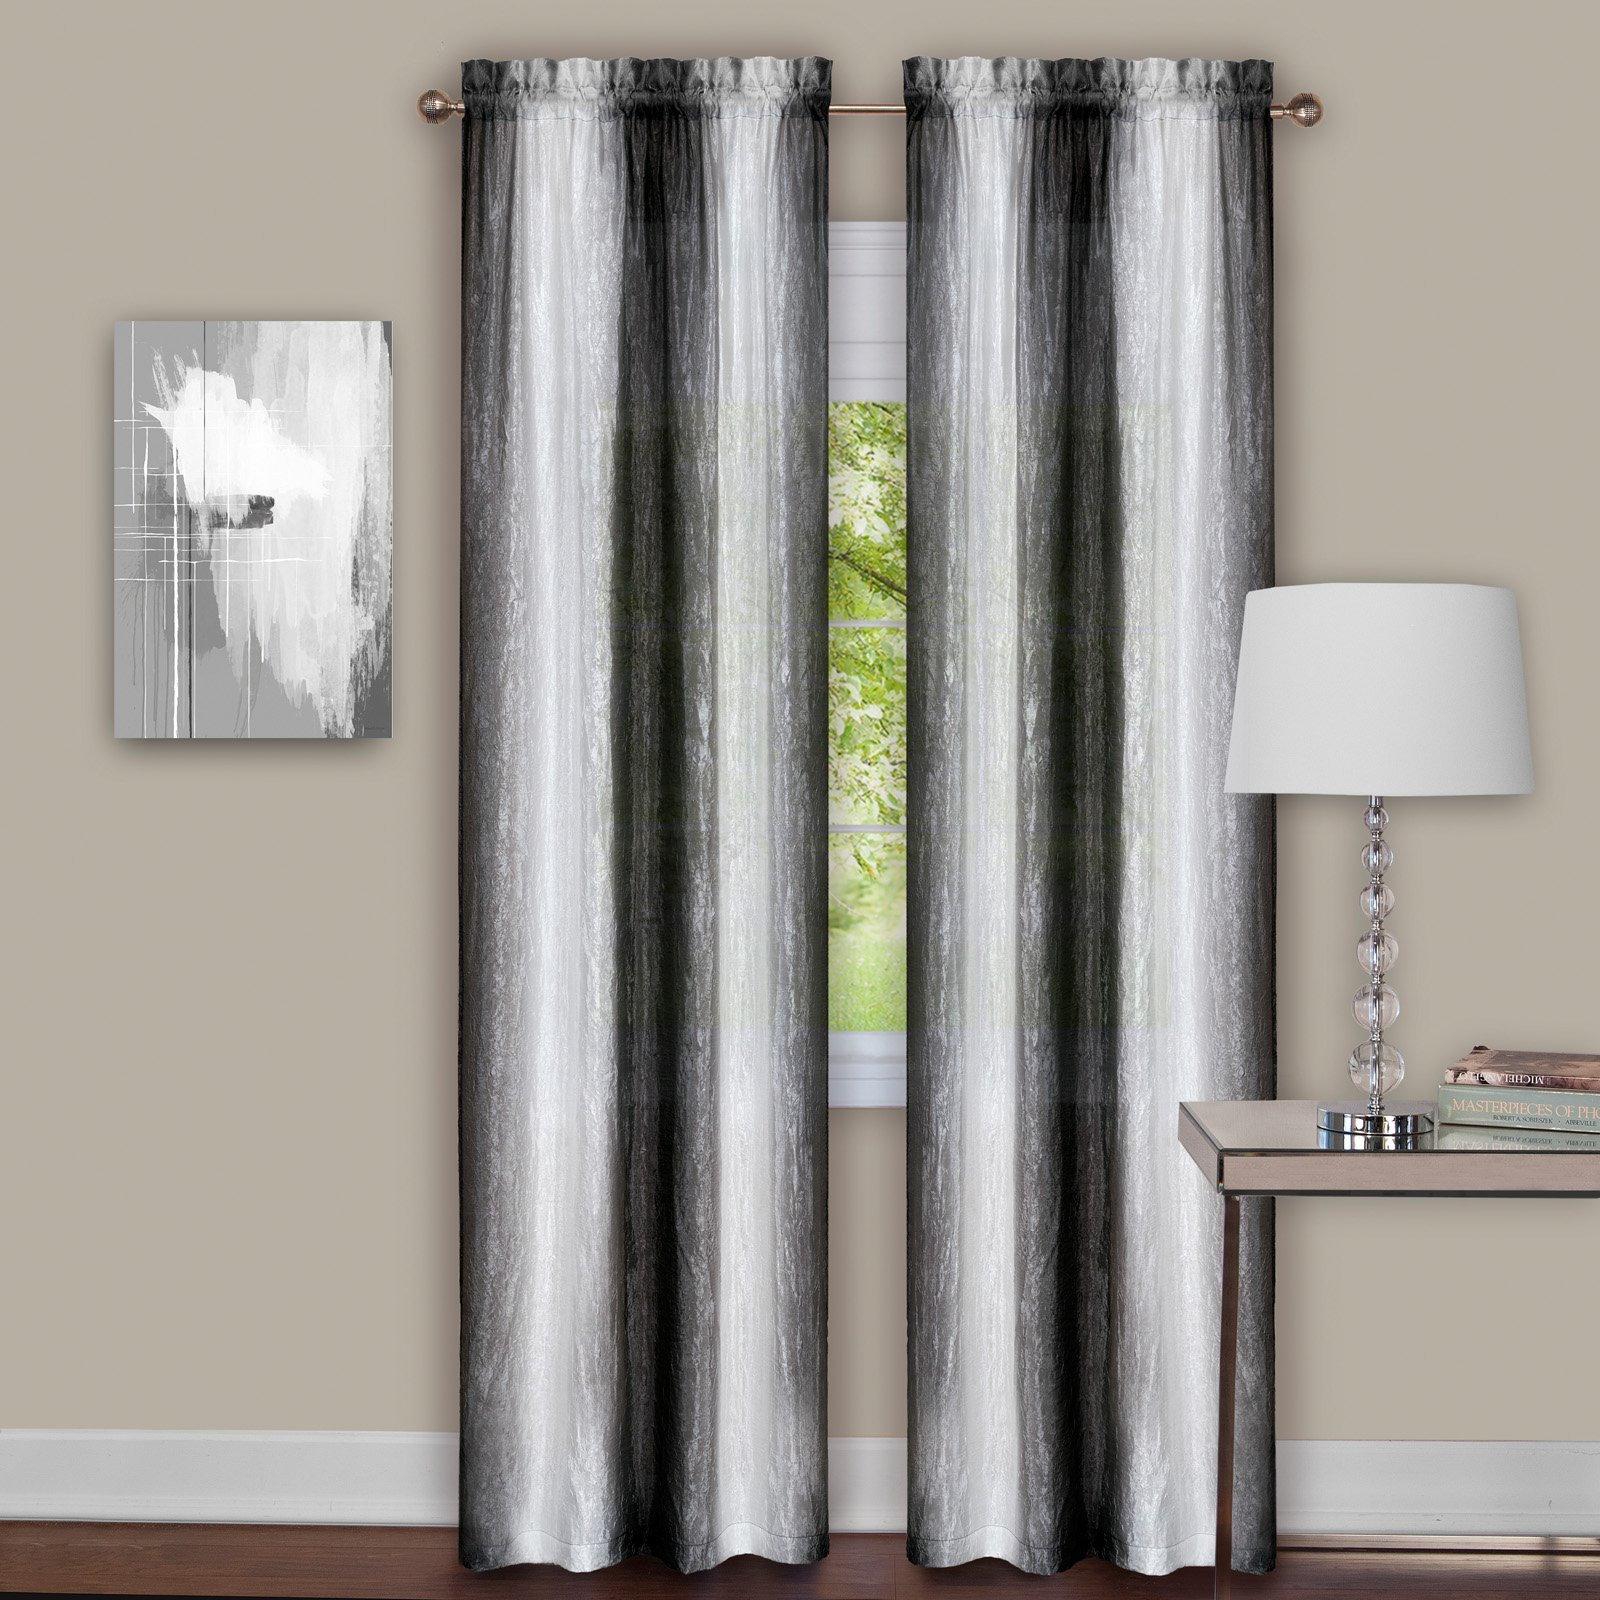 Japanese panel curtains - Japanese Panel Curtains 35